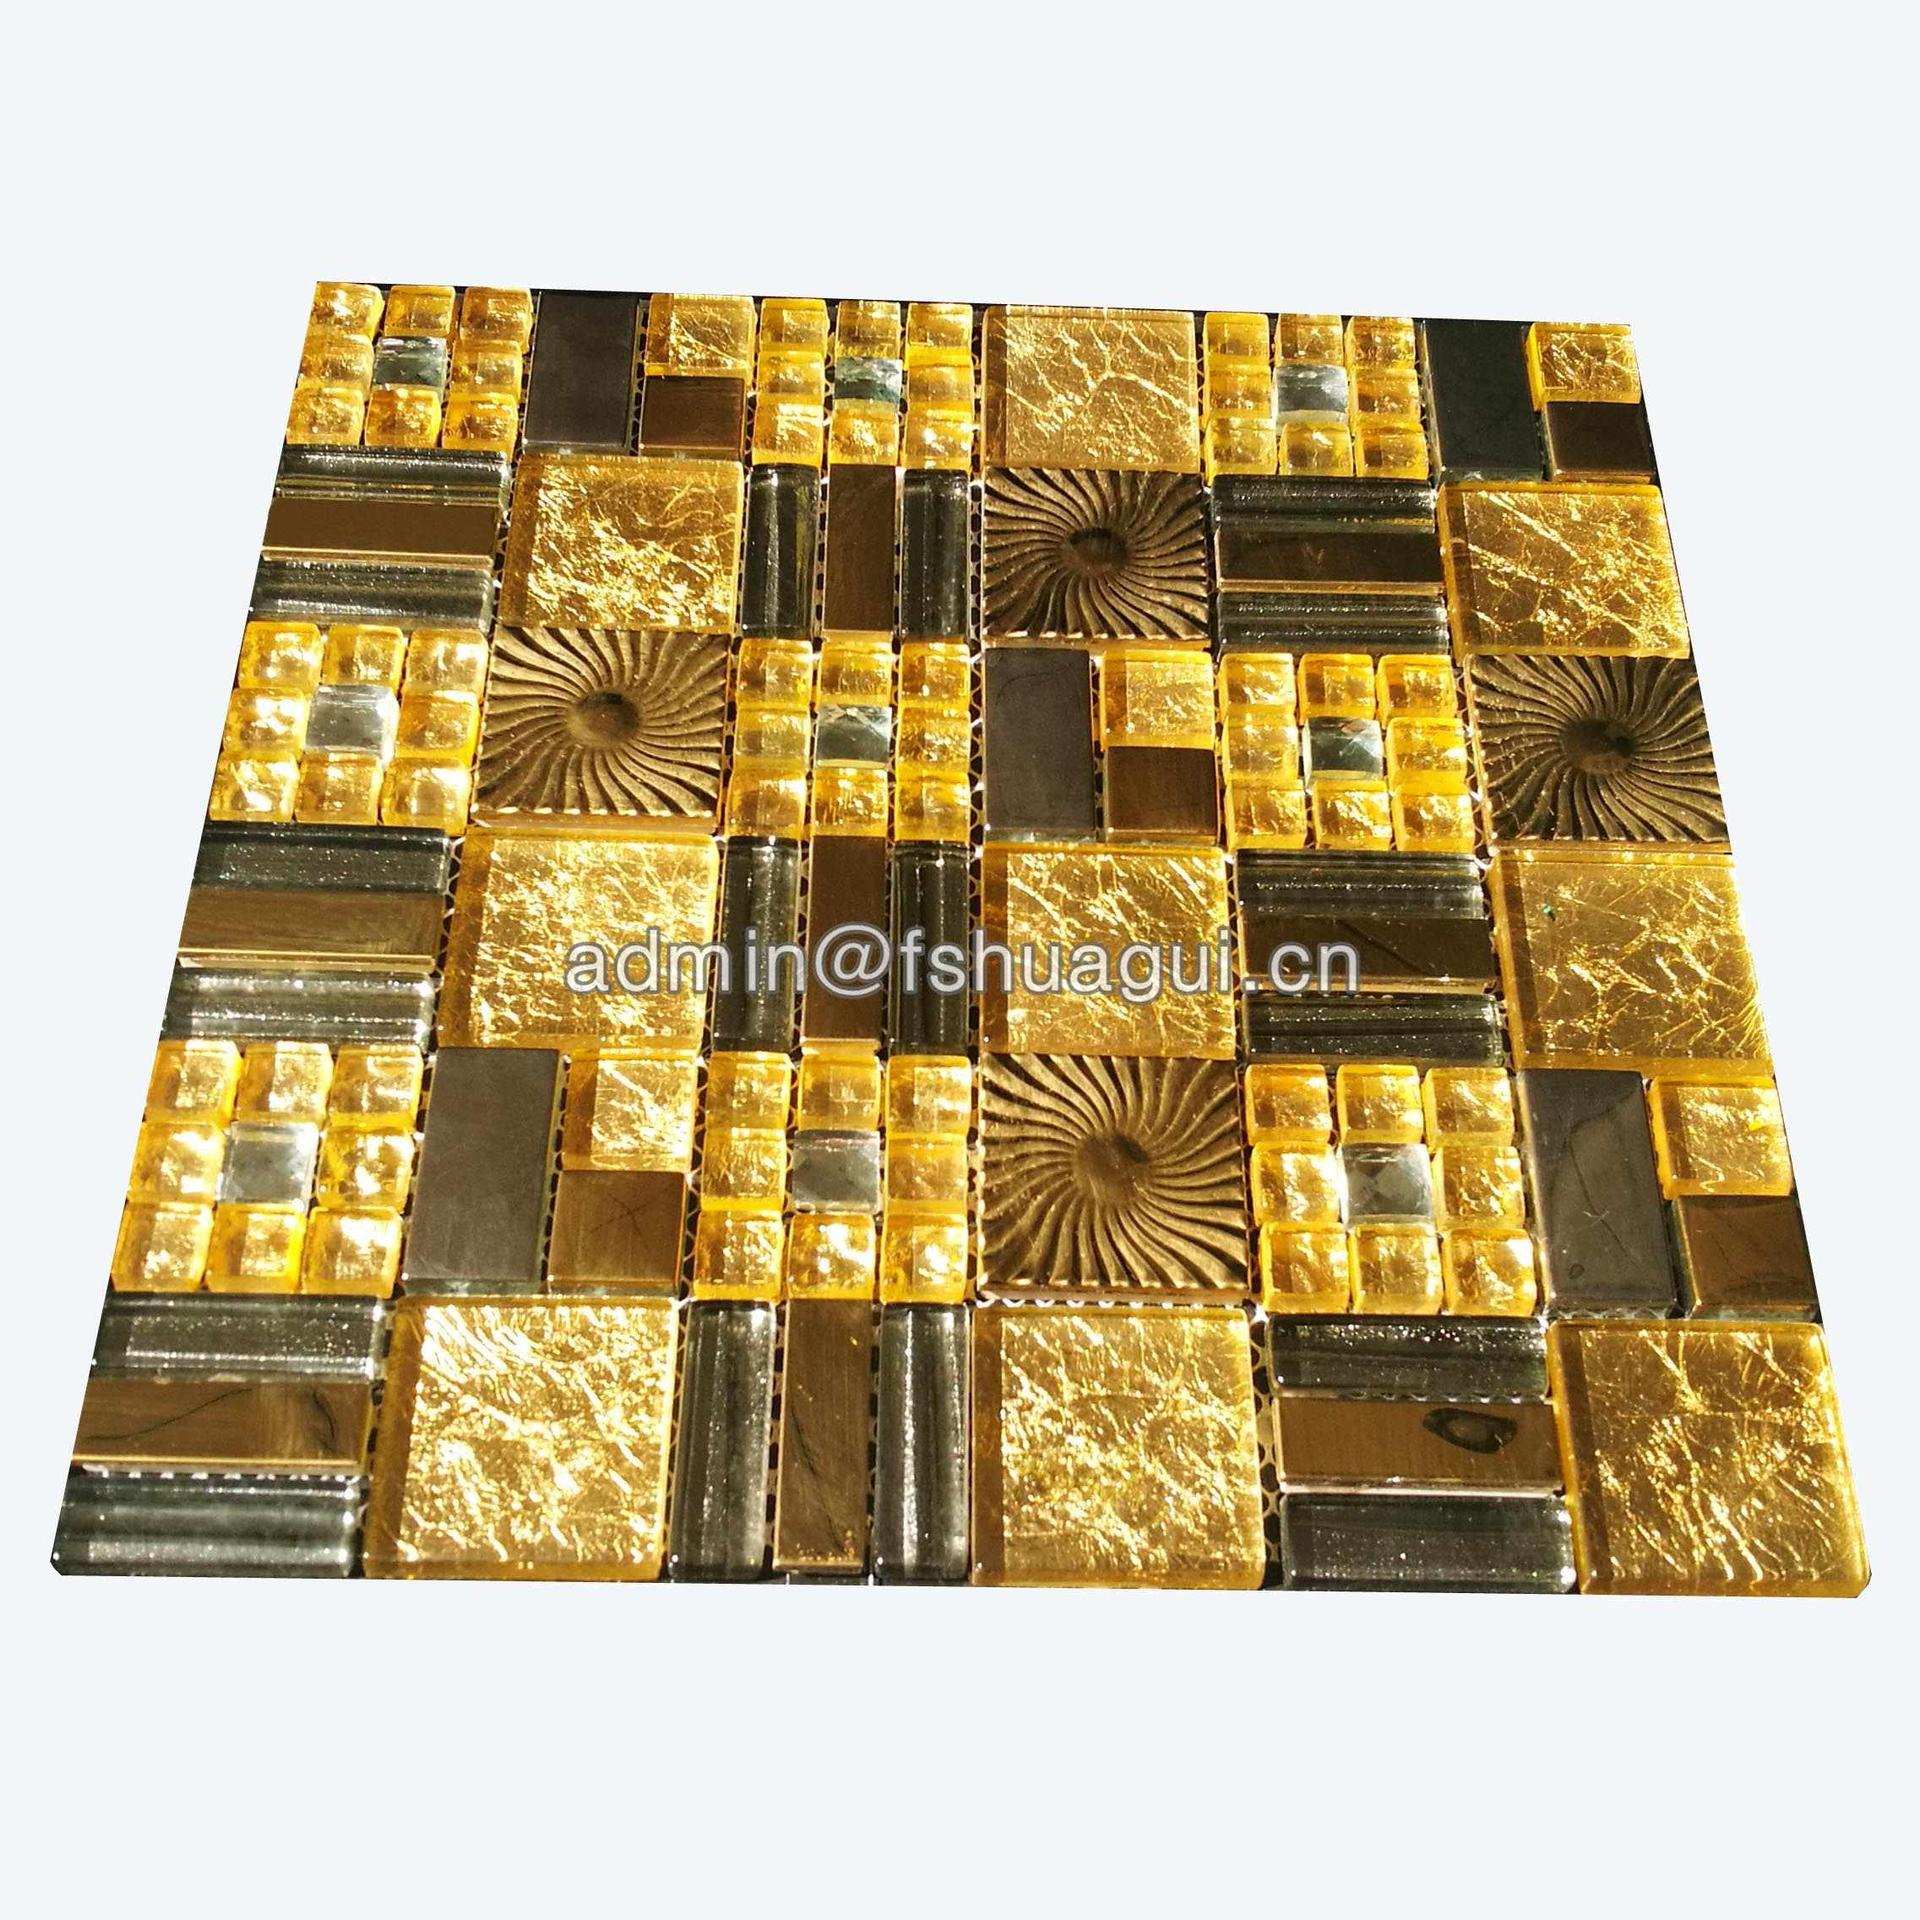 Free design gold glass mixed metal wall backsplash mosaic tile